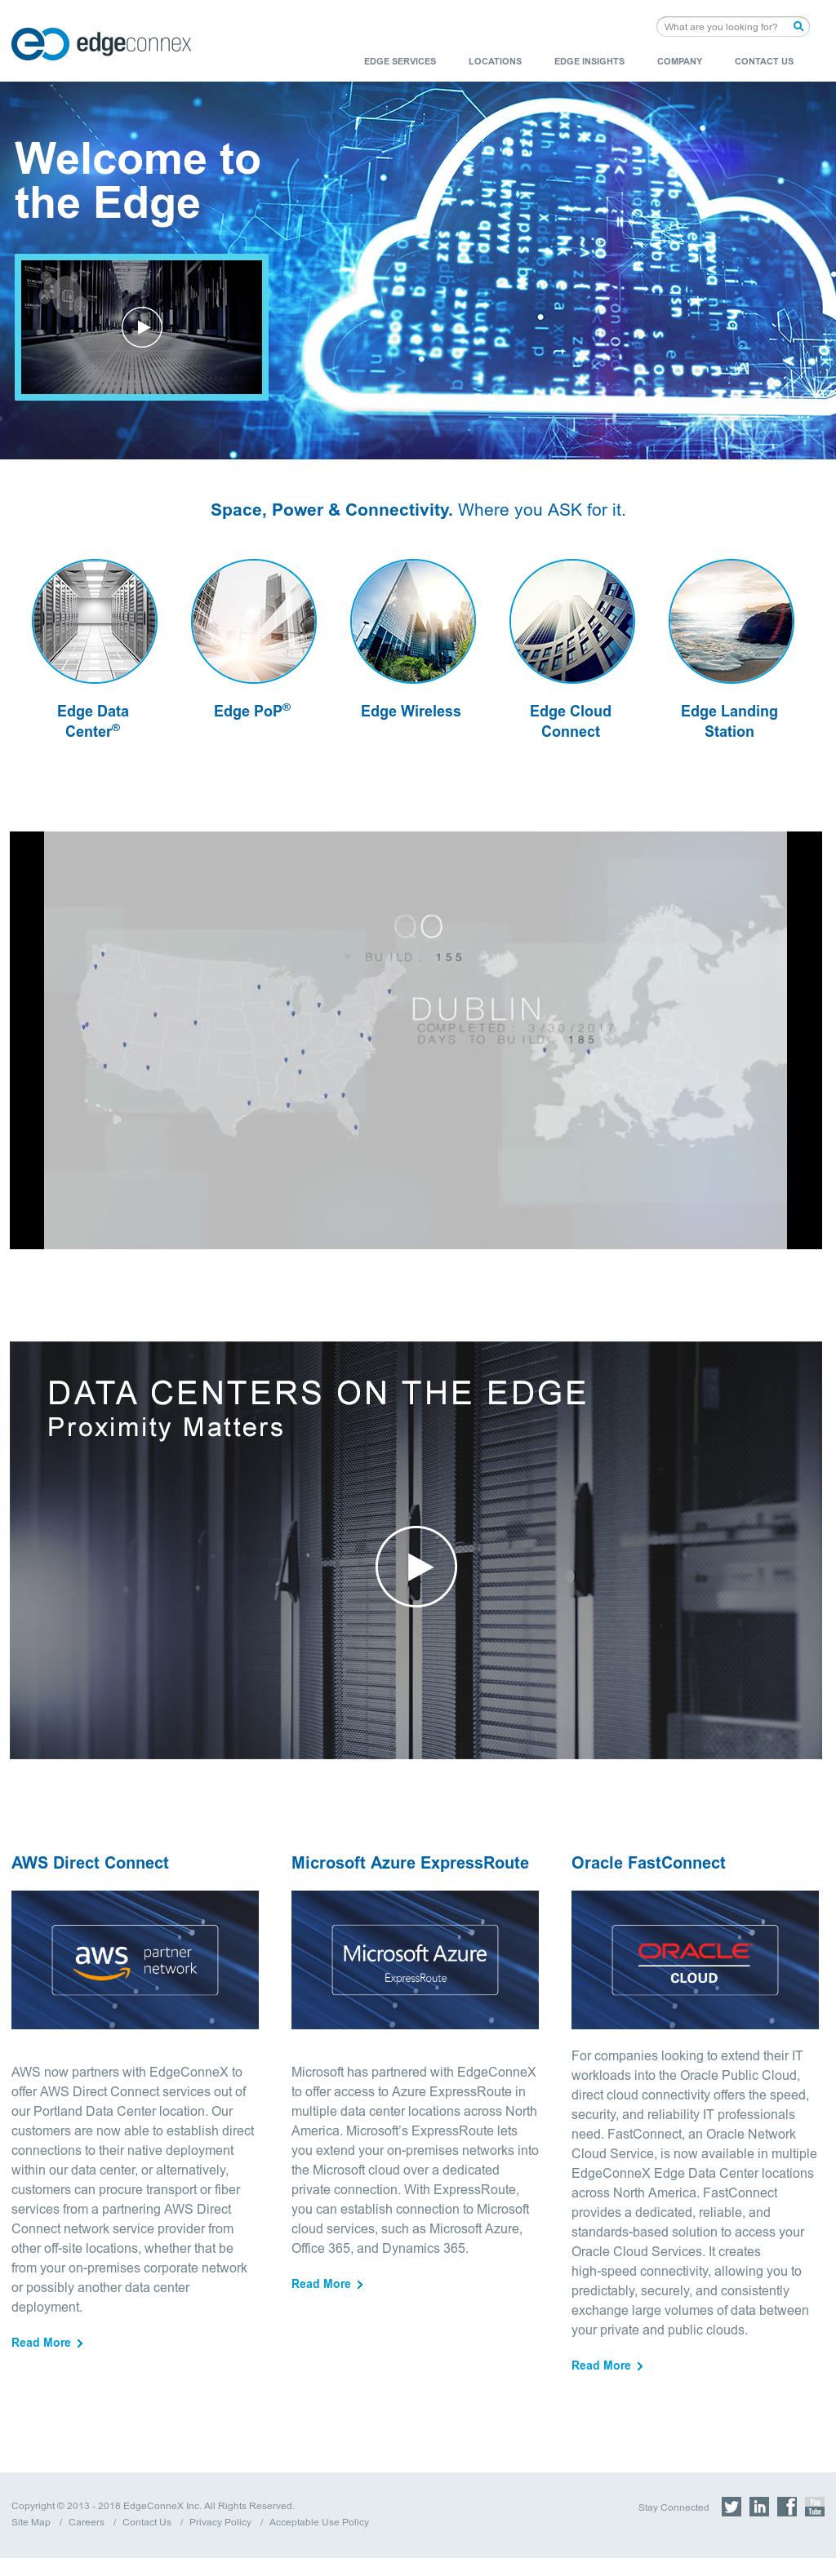 EdgeConneX Competitors, Revenue and Employees - Owler Company Profile